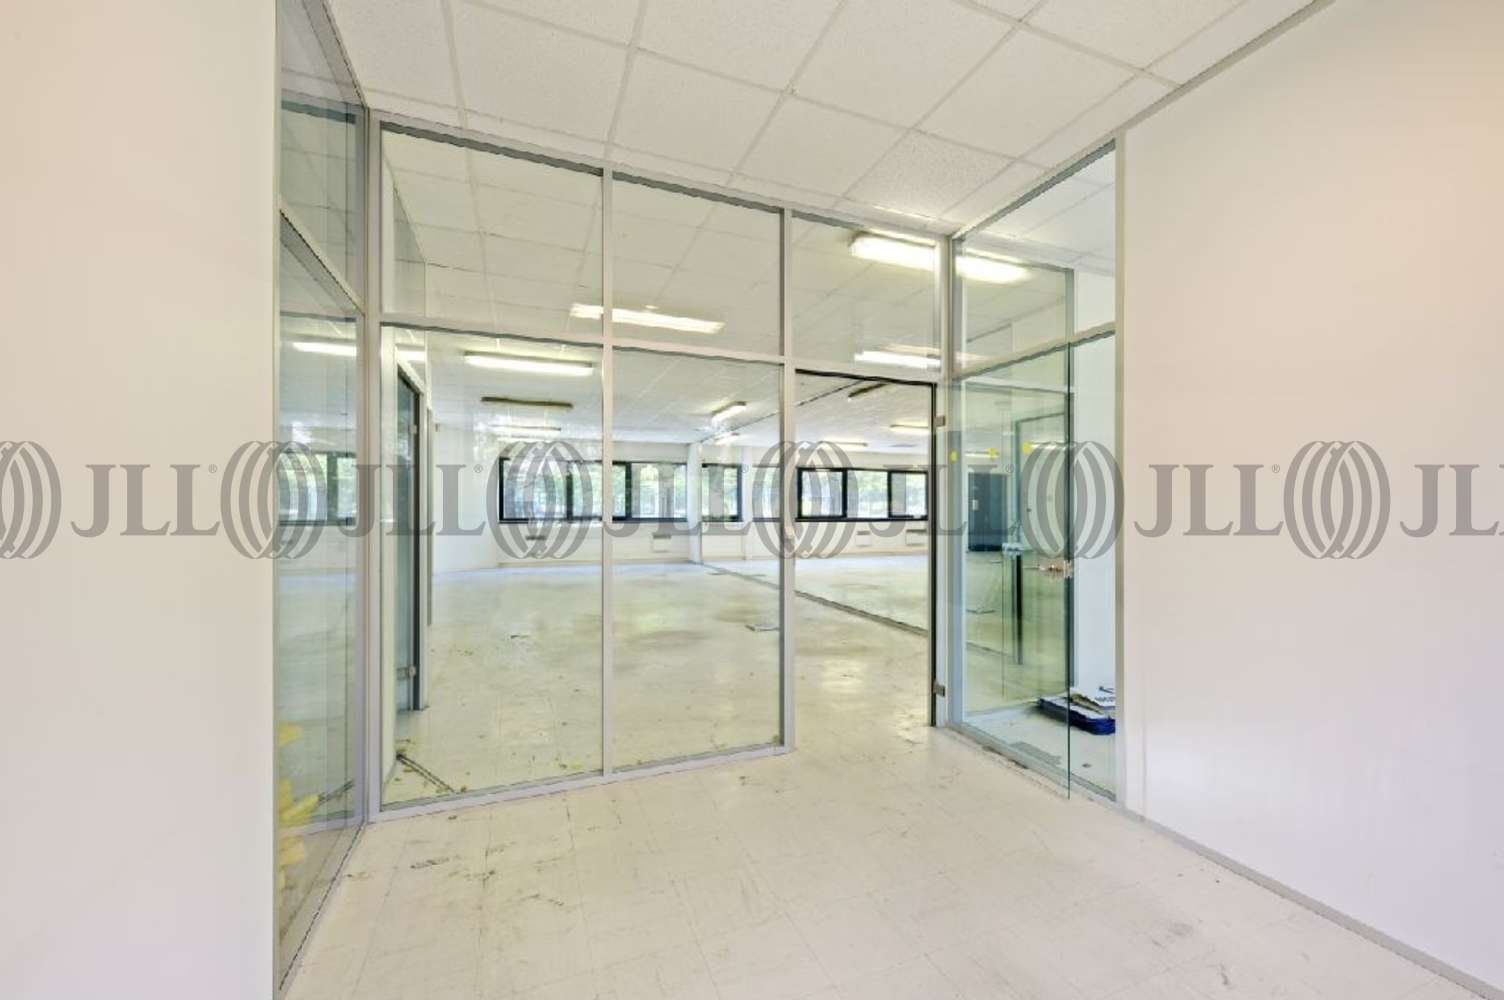 Activités/entrepôt Villebon sur yvette, 91140 - HIGHTEC 3 - 9586580